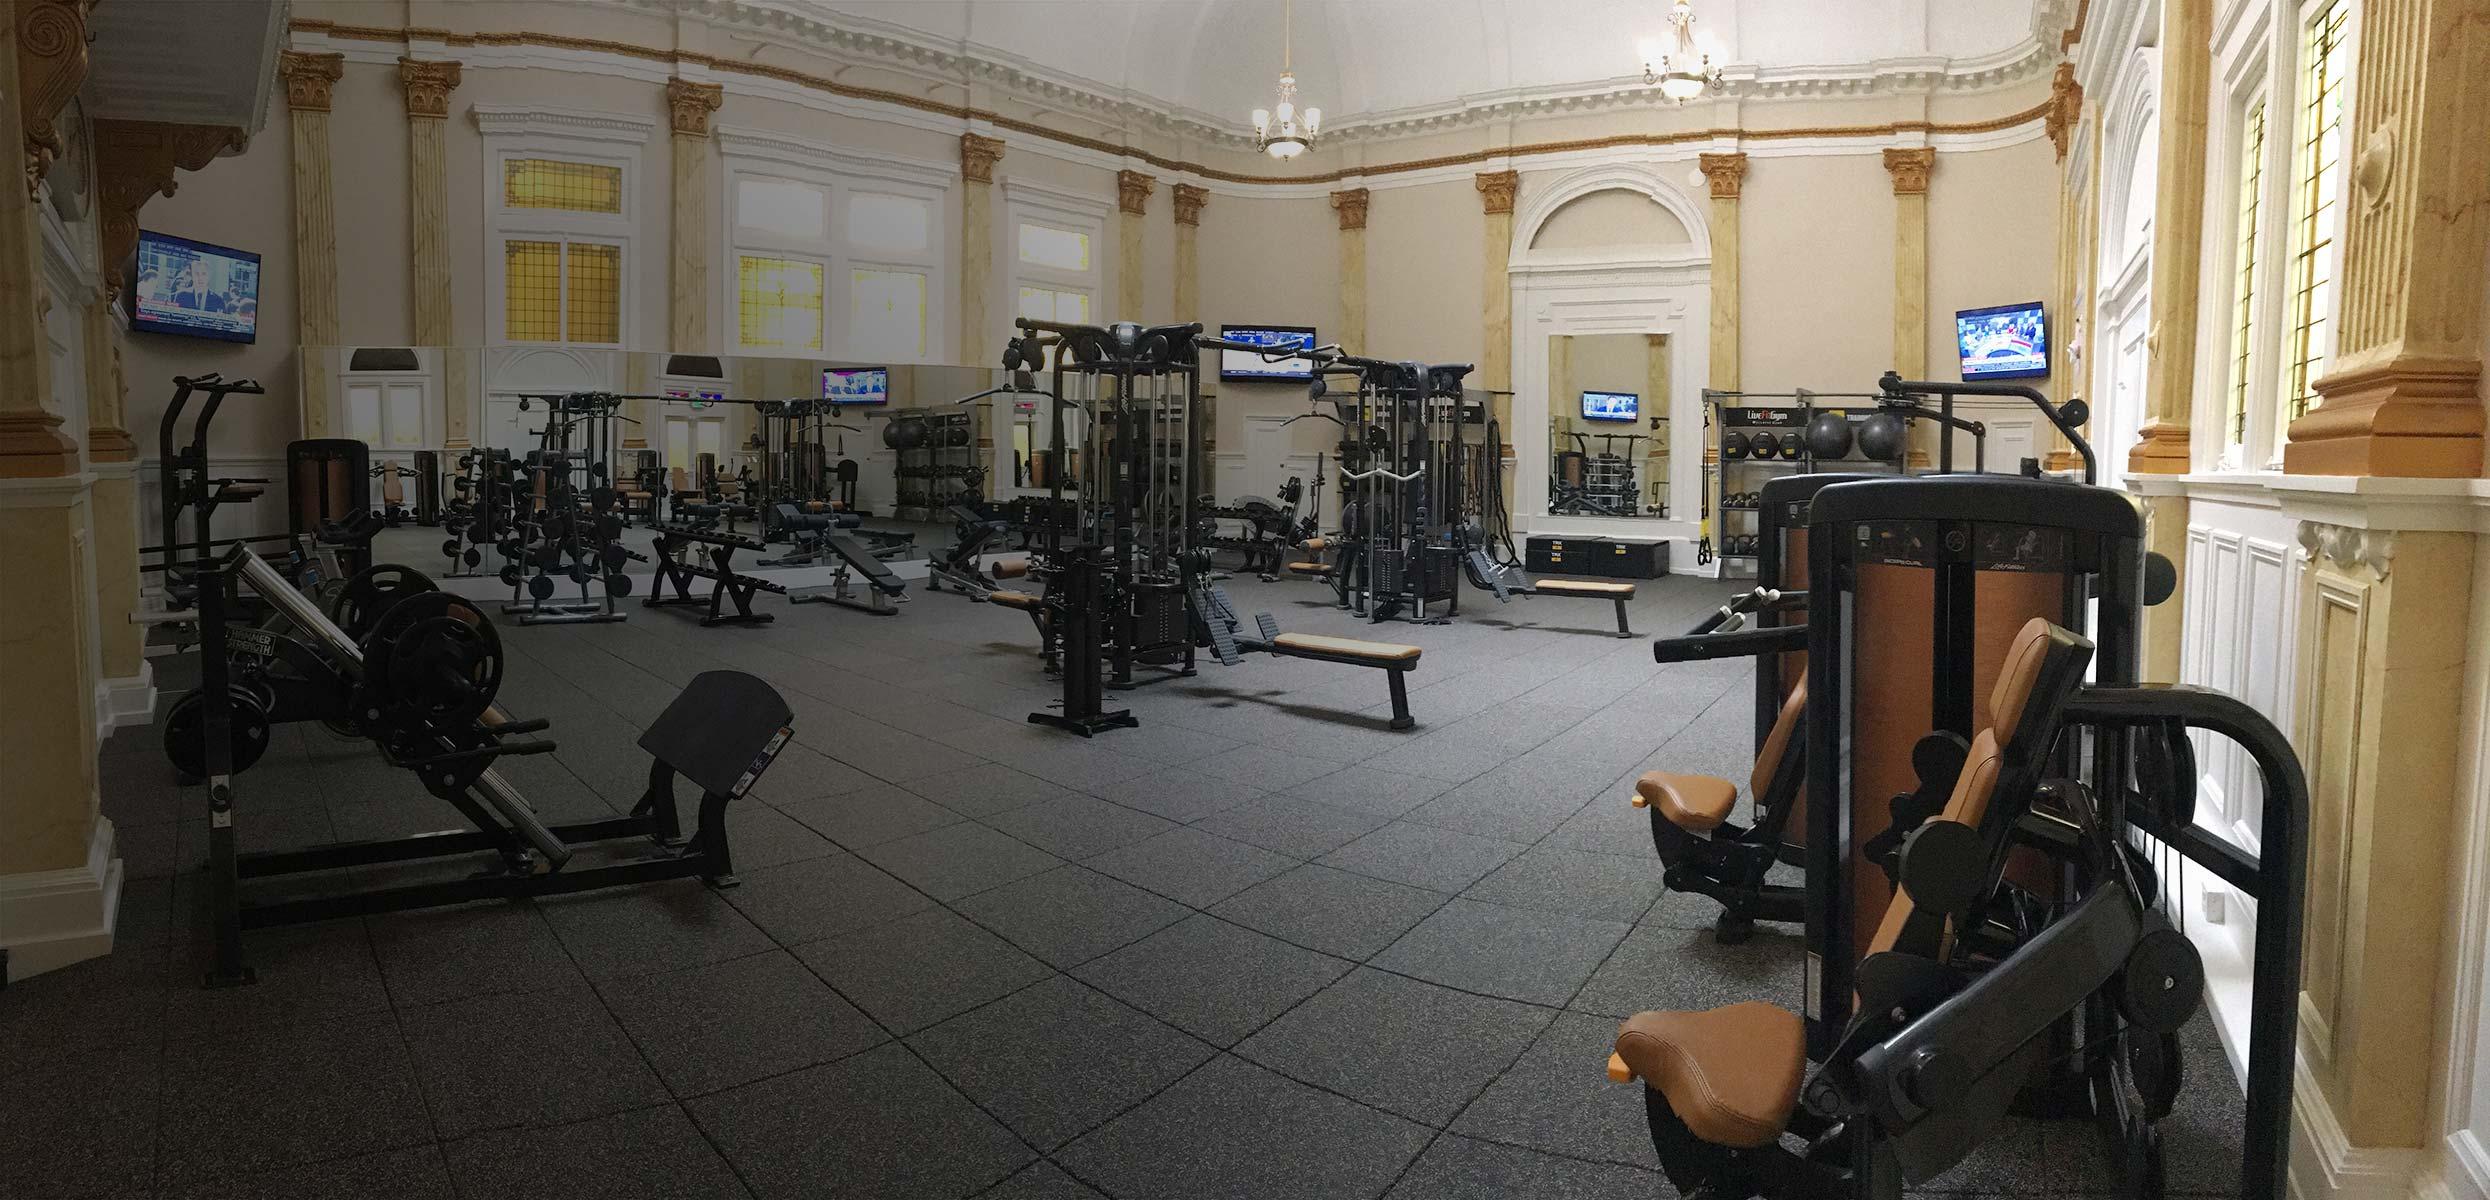 live fit gym & wellness club in san francisco